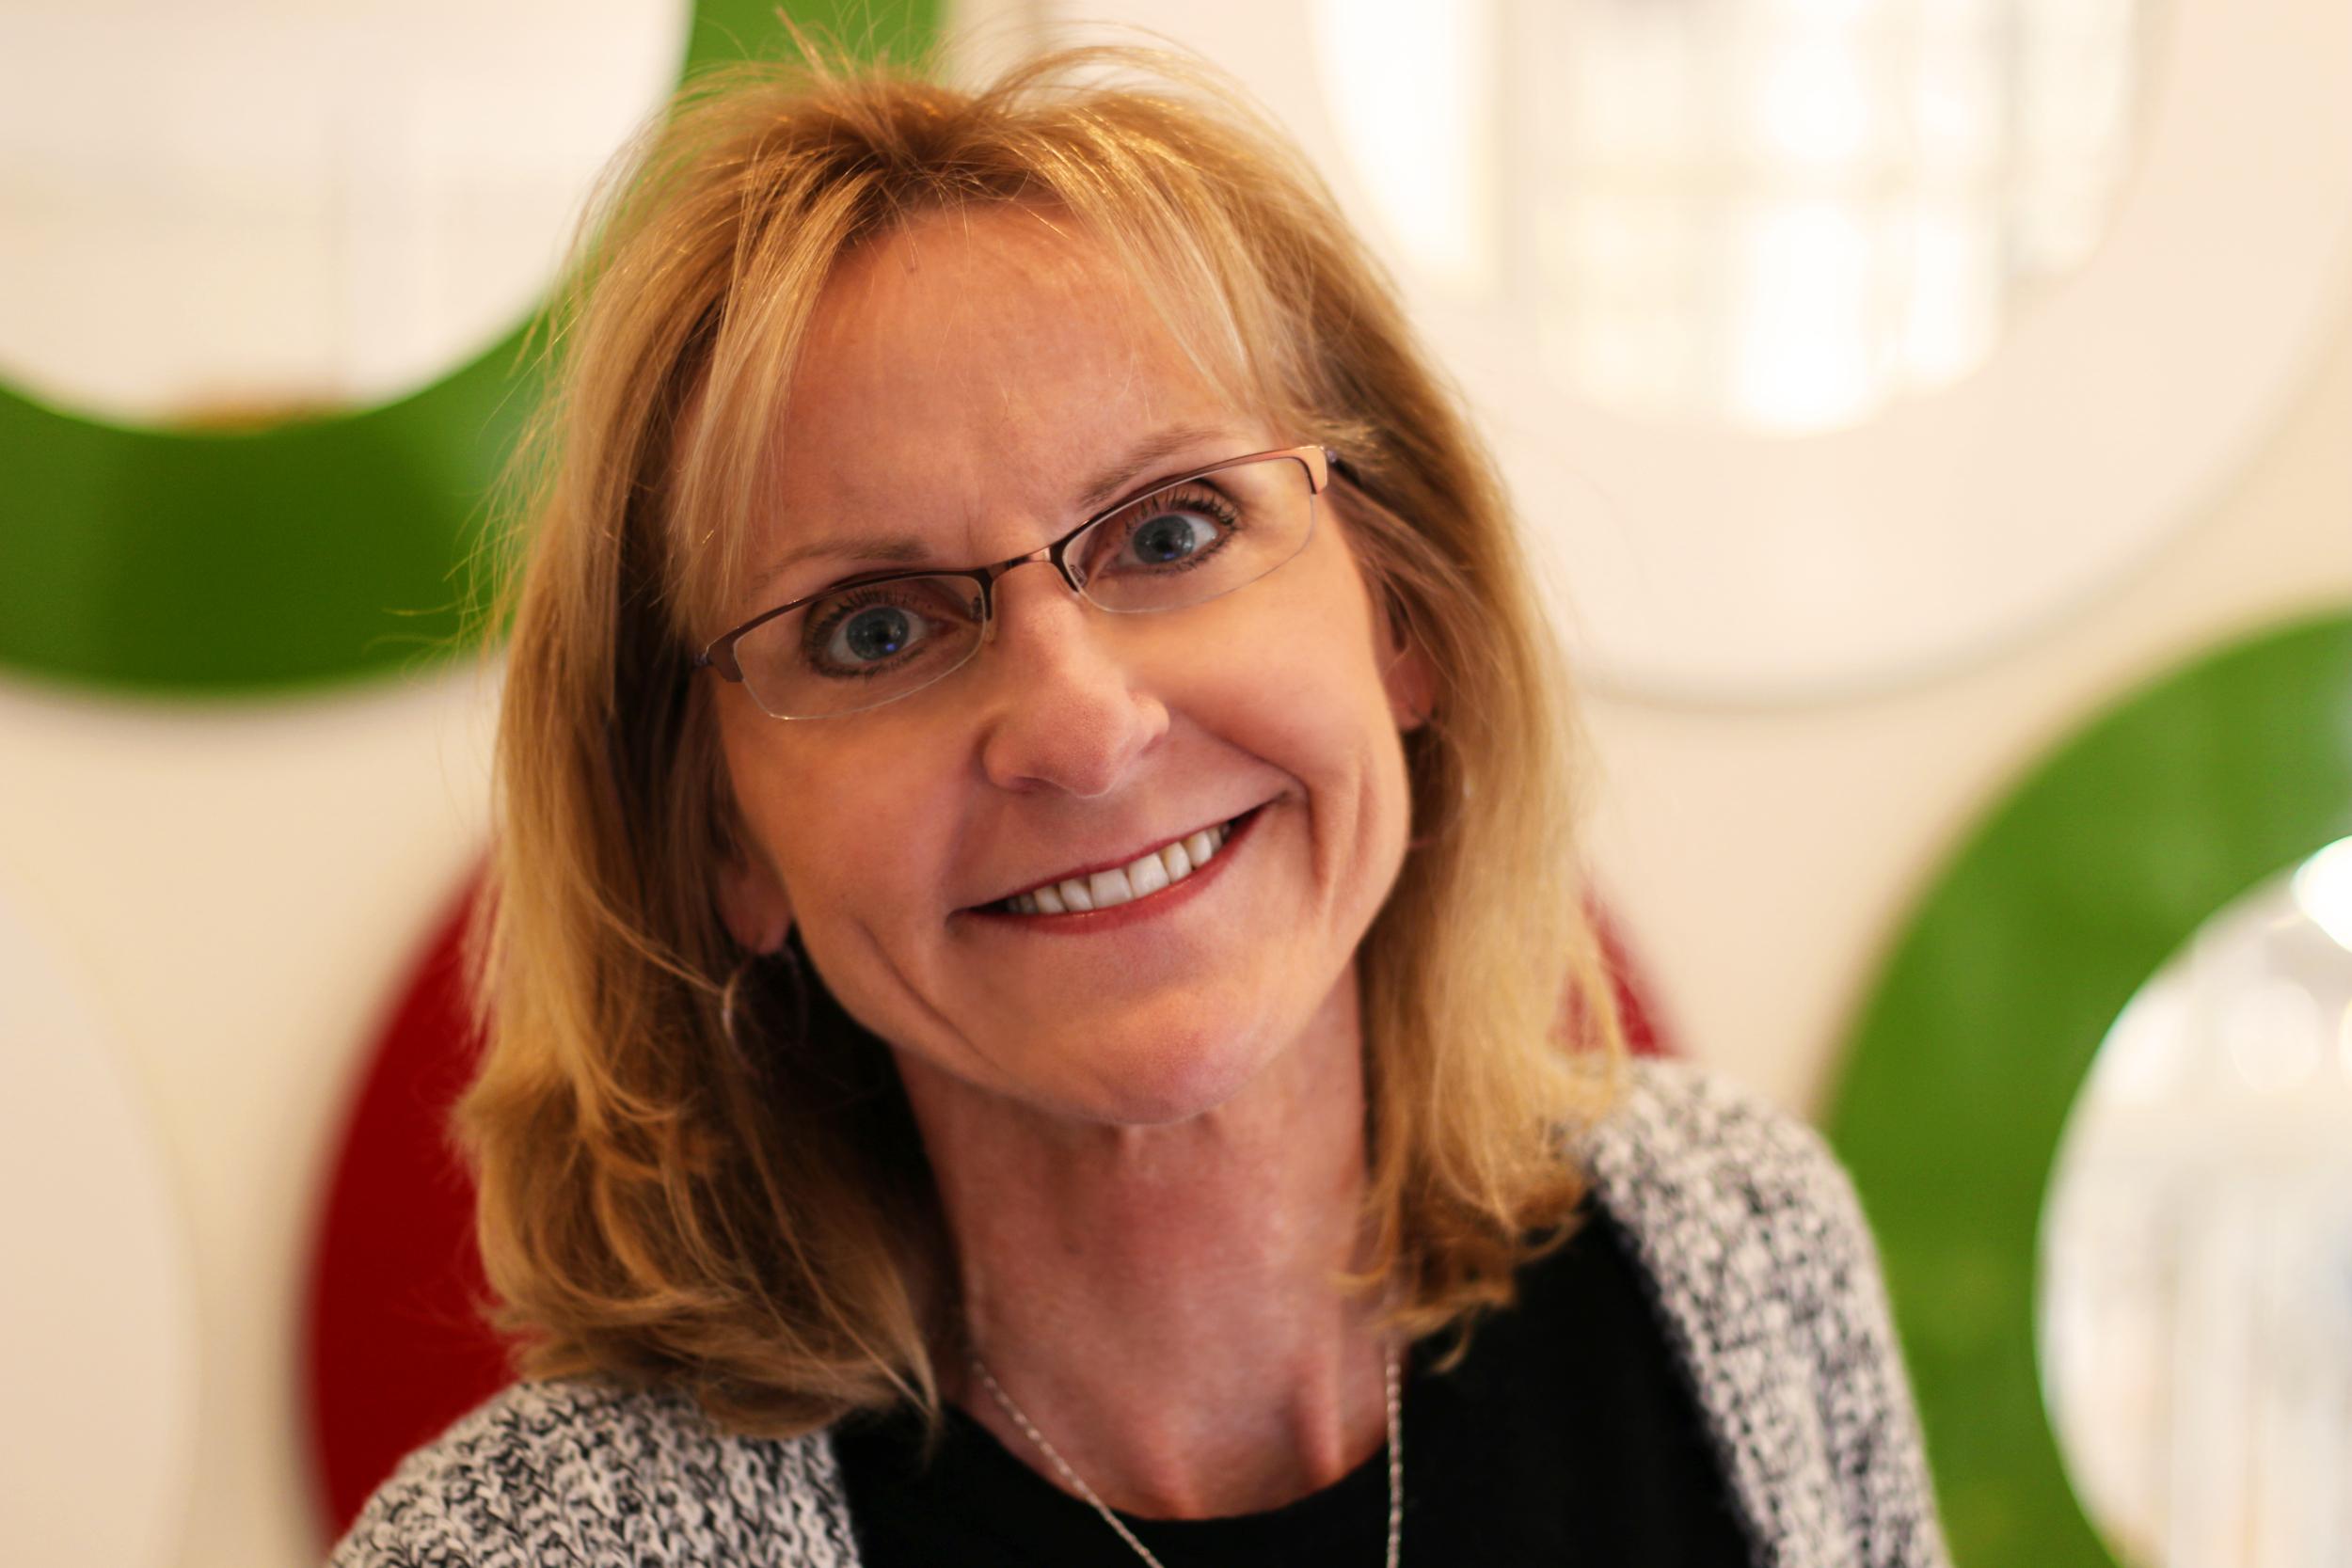 Susan Baxter, Managing Partner